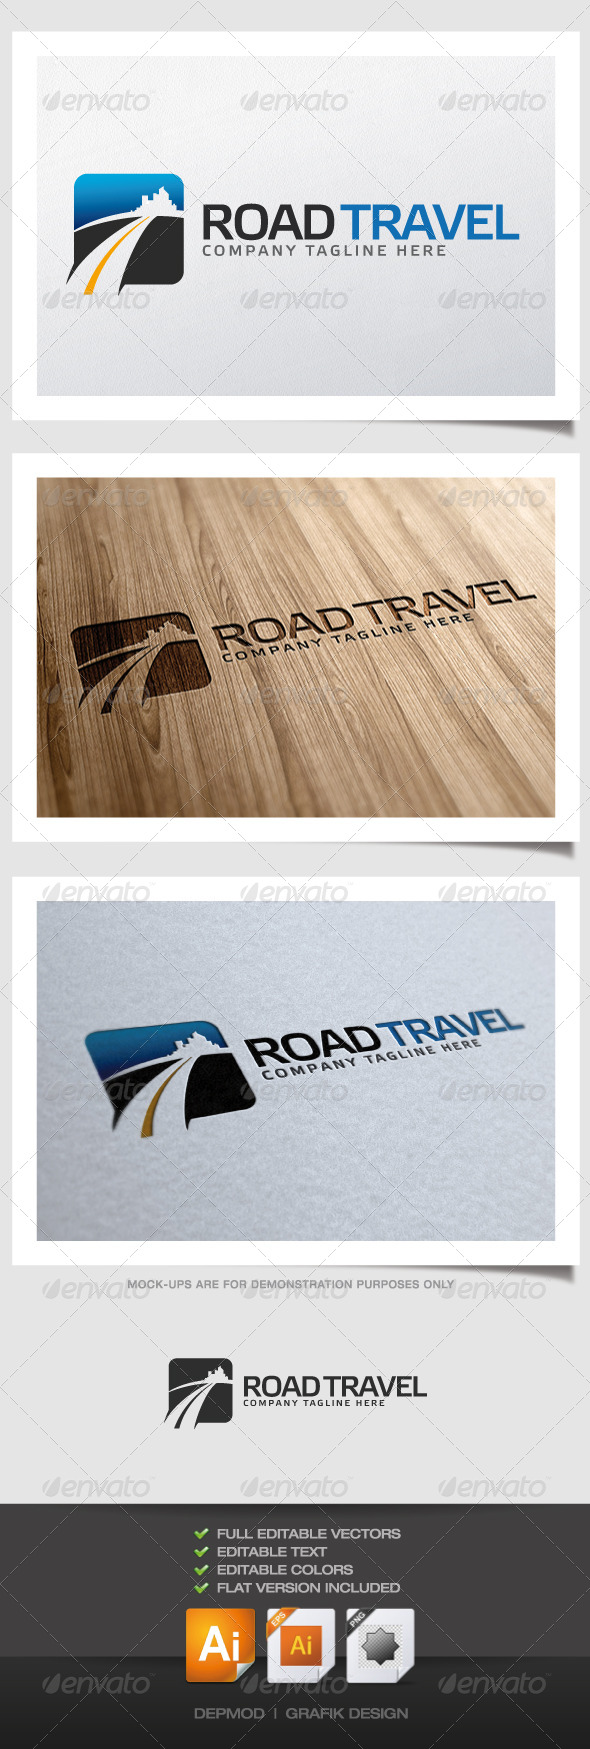 GraphicRiver Road Travel Logo 4448848